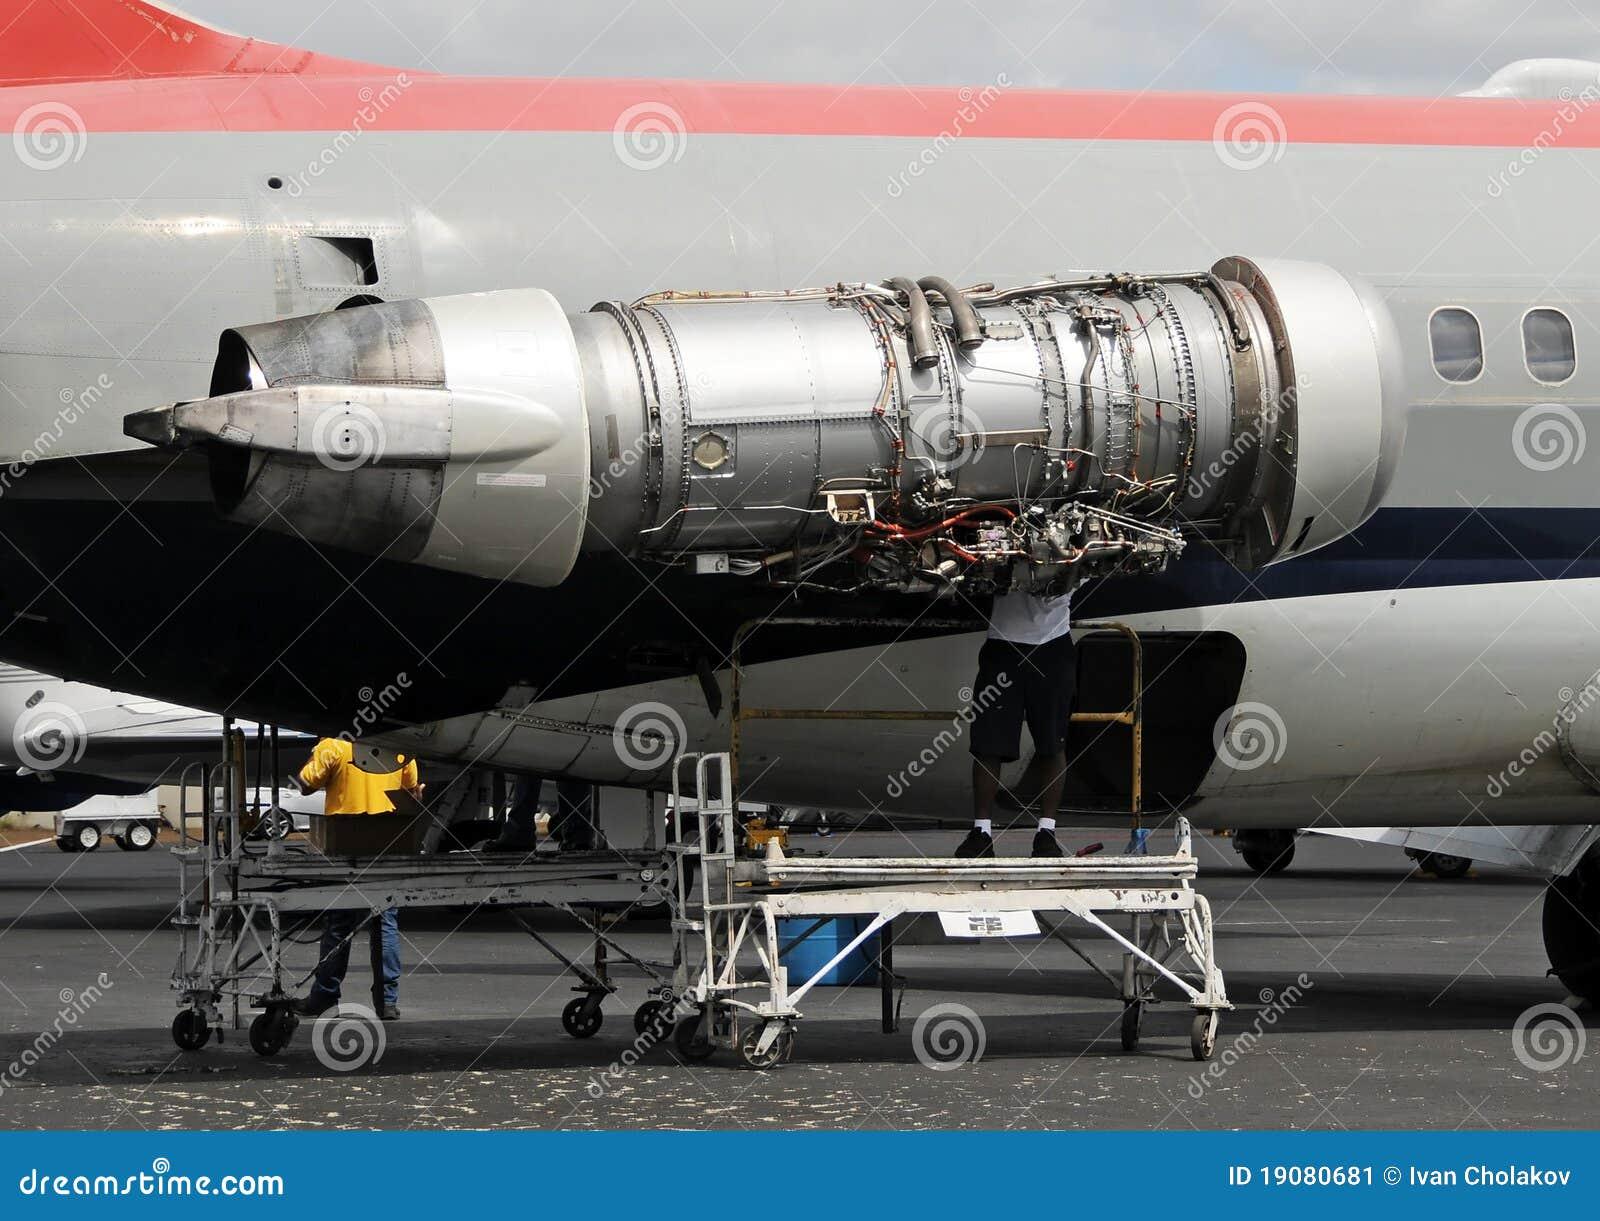 jet engine repair stock image image 19080681